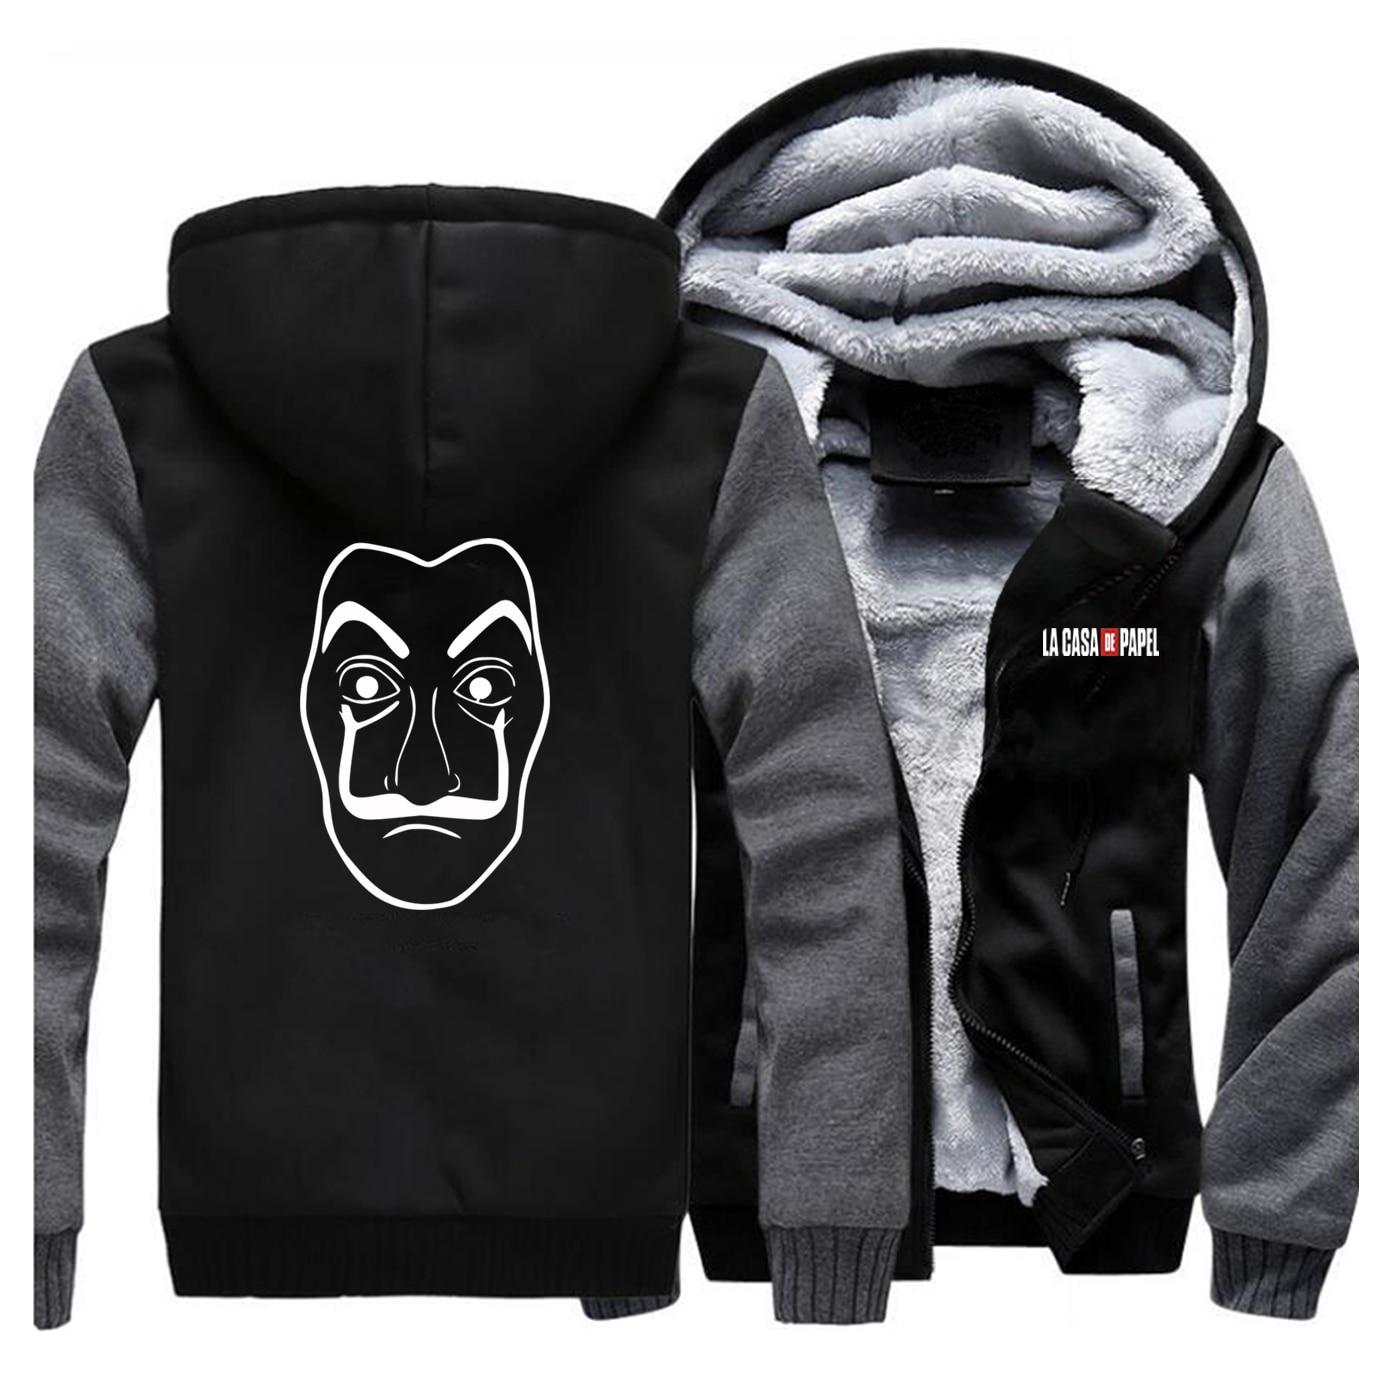 La casa de papel jaquetas homem programa tv professor sergio marquina sweatshirts hoodies inverno grosso com zíper casacos de roupas esportivas outwear